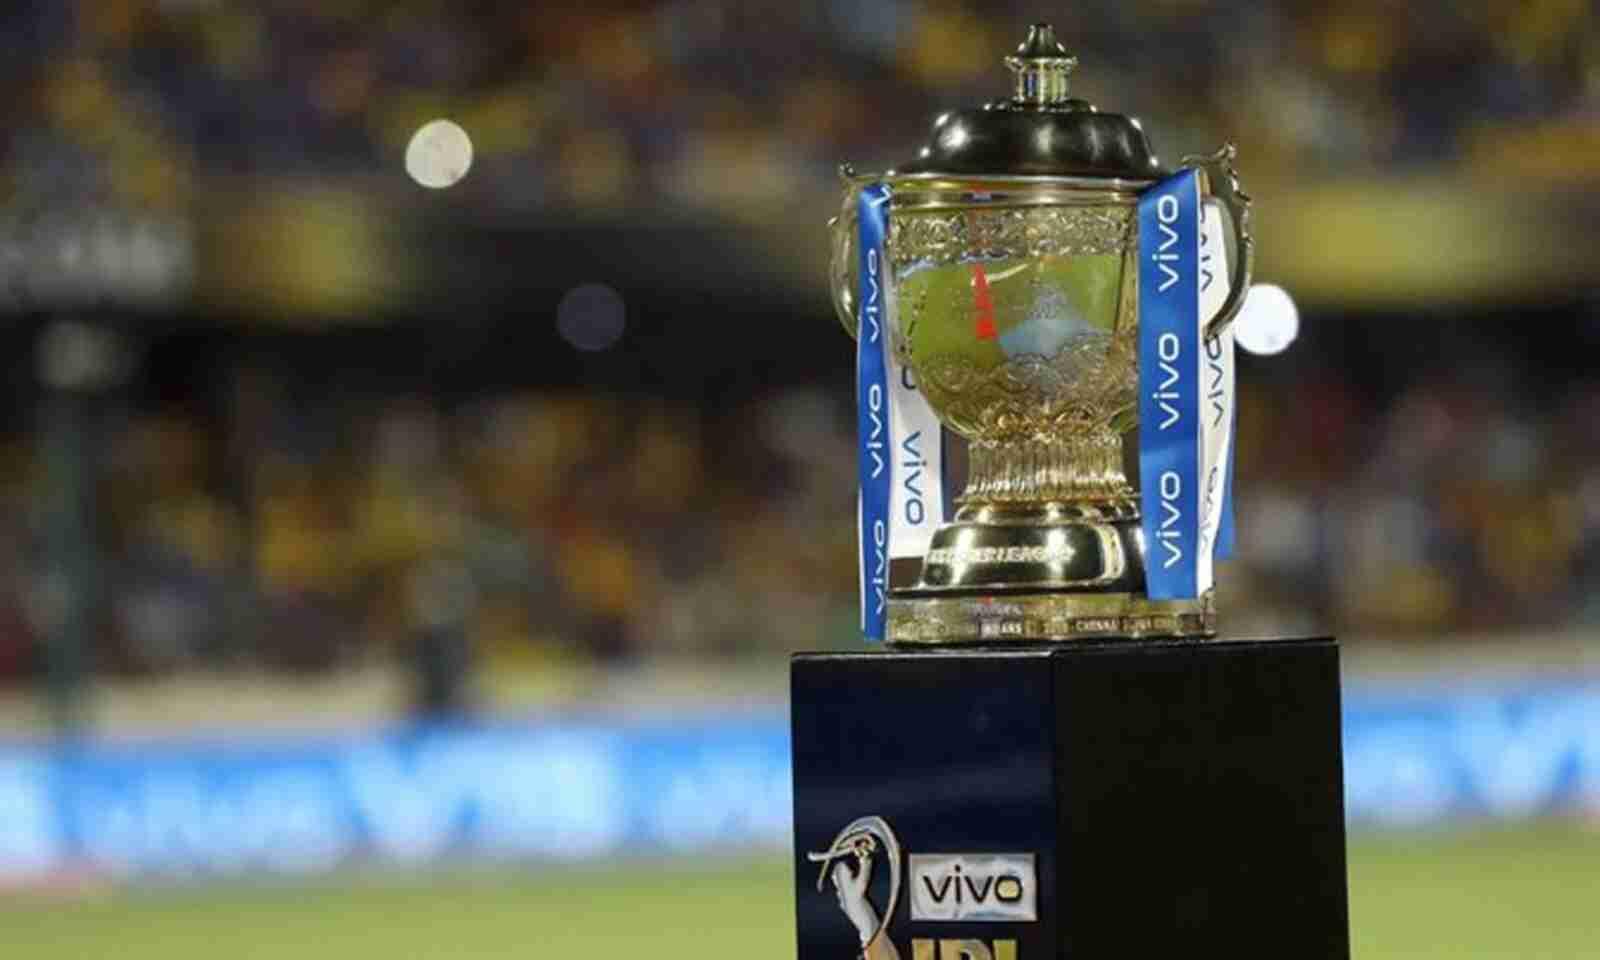 IPL 2021 to resume in the UAE in September-October | ஐபிஎல் 2021 ஐக்கிய அரபு எமிரேட்ஸில் செப்டம்பர்-அக்டோபர் மாதங்களில் மீண்டும் தொடங்க உள்ளது |_40.1